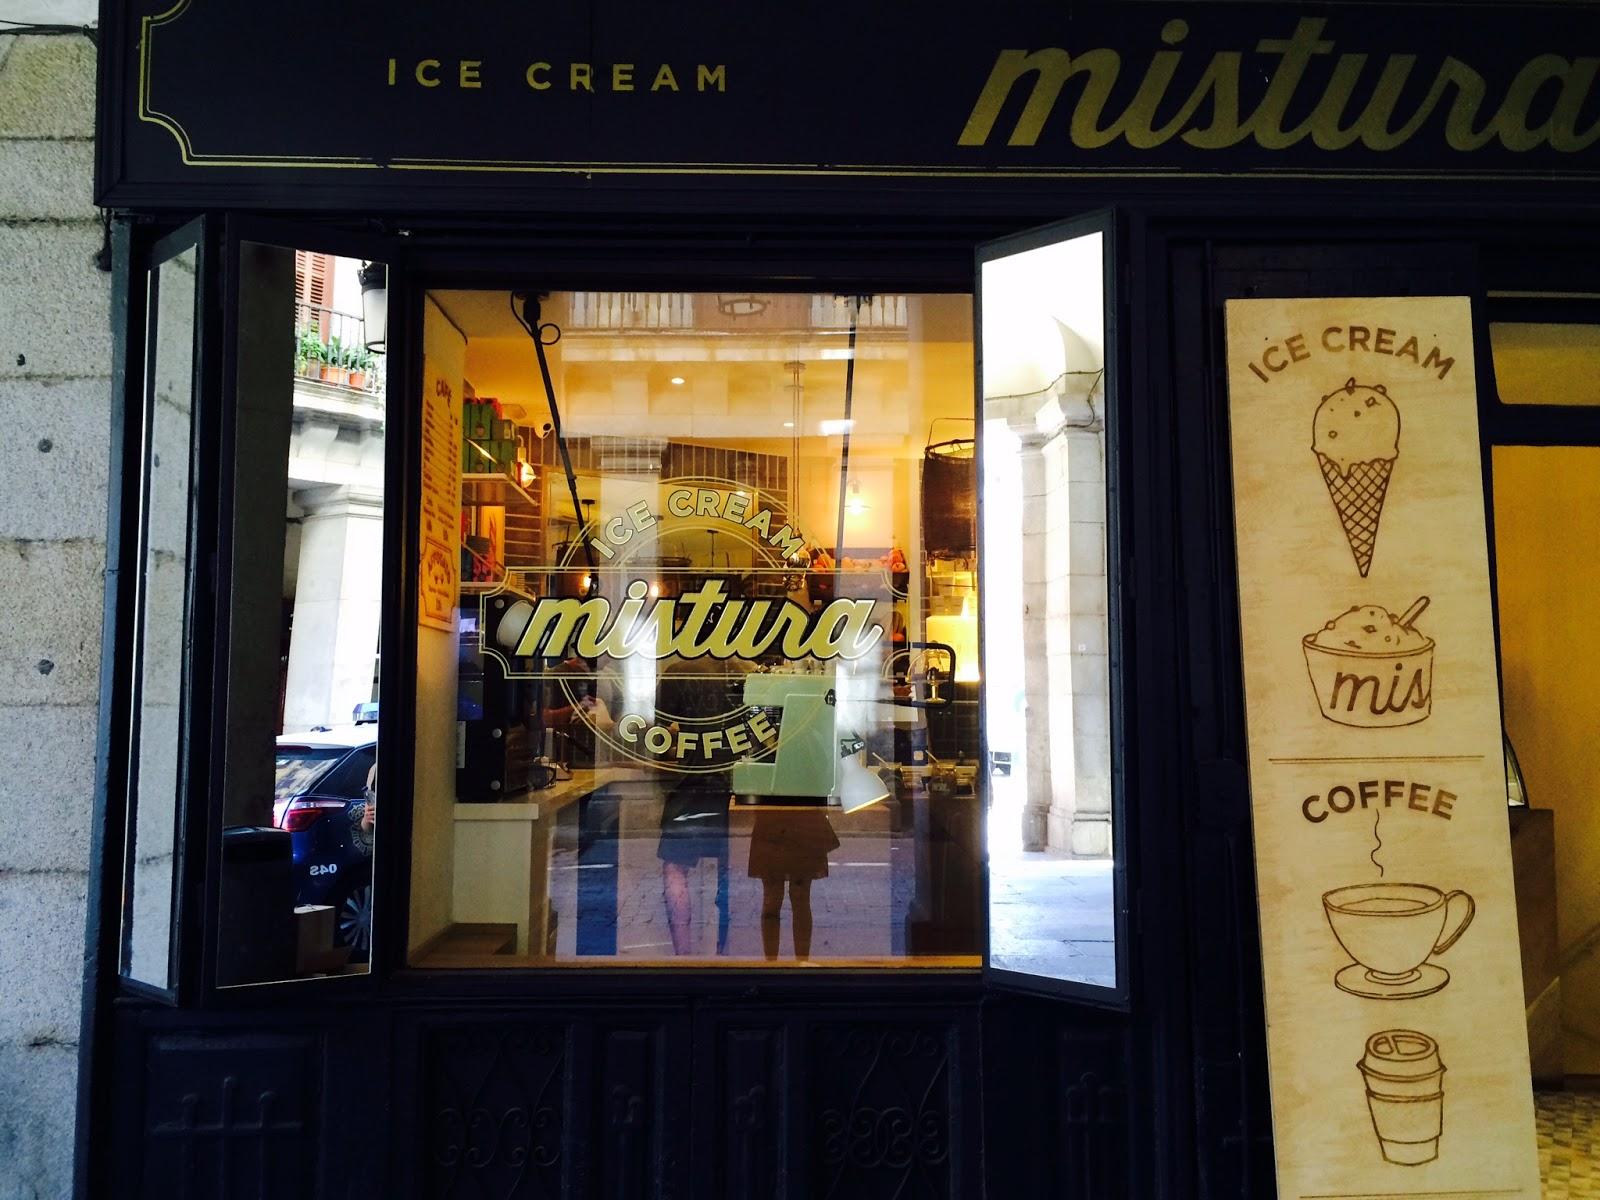 Mistura Ice Cream Madrid - Hostpot